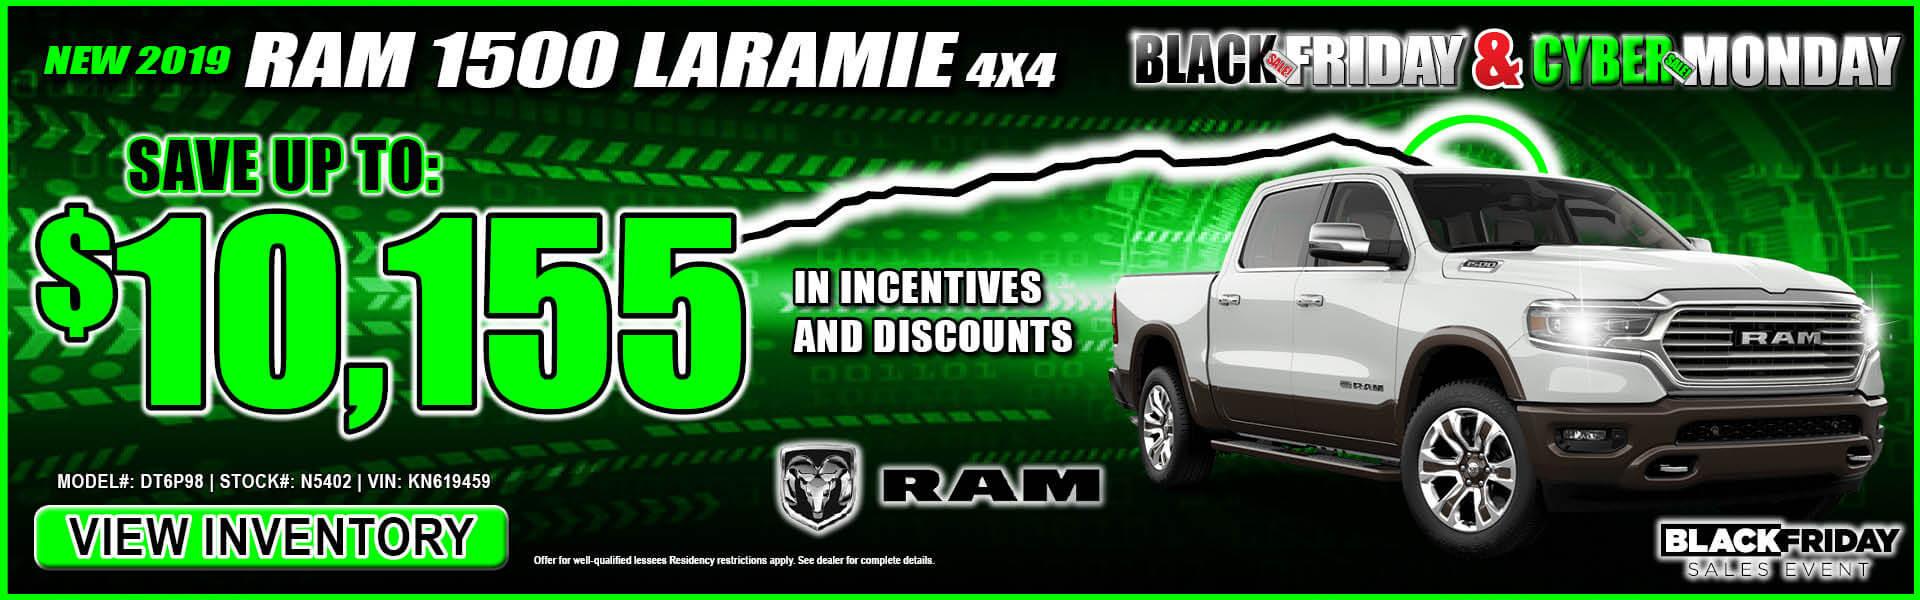 Ram 1500 $10,155 Incentives